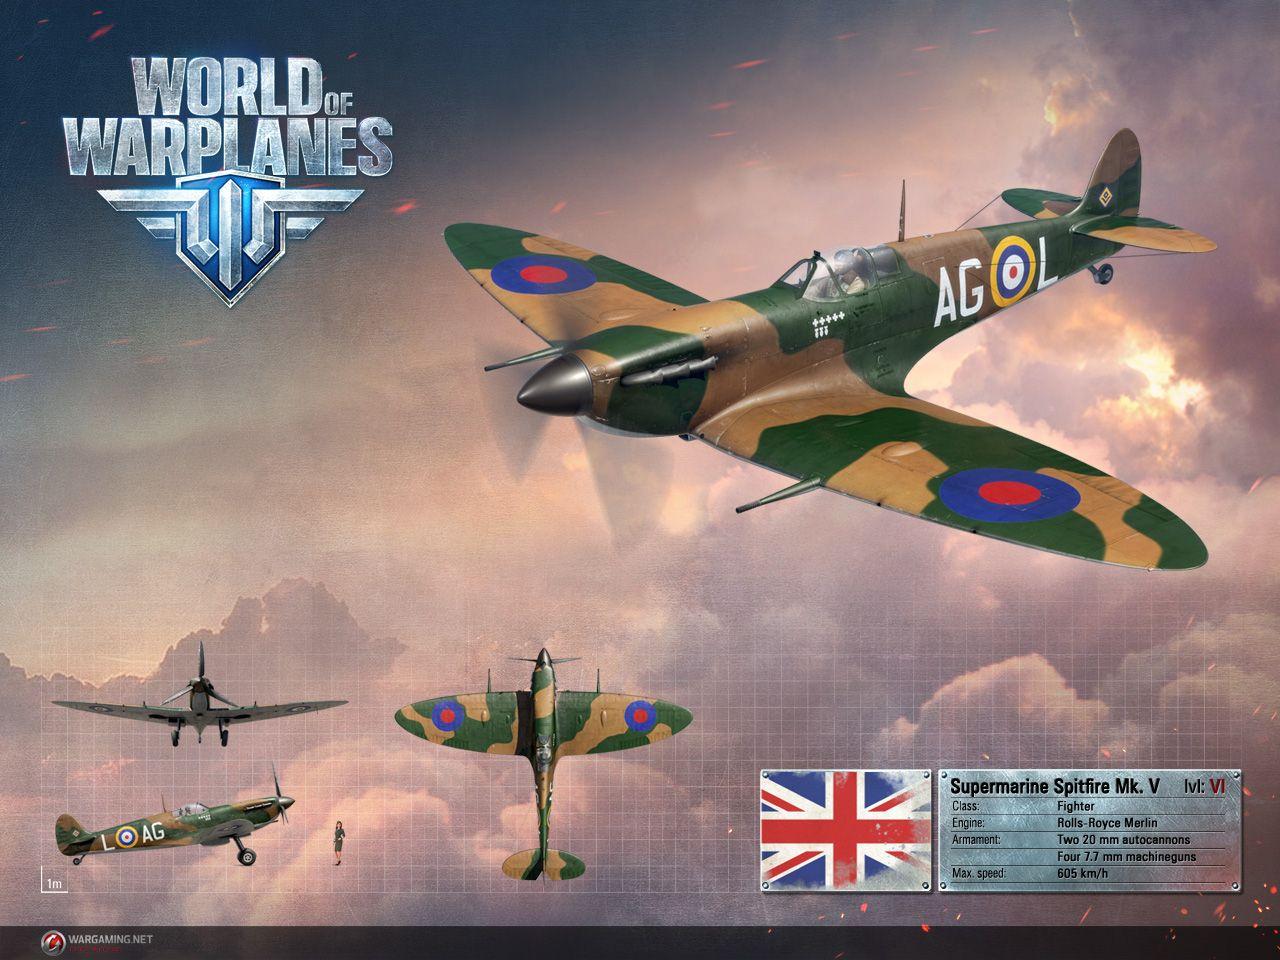 Supermarine Spitfire V World Of Warplanes Warplane Supermarine Spitfire Fighter Aircraft